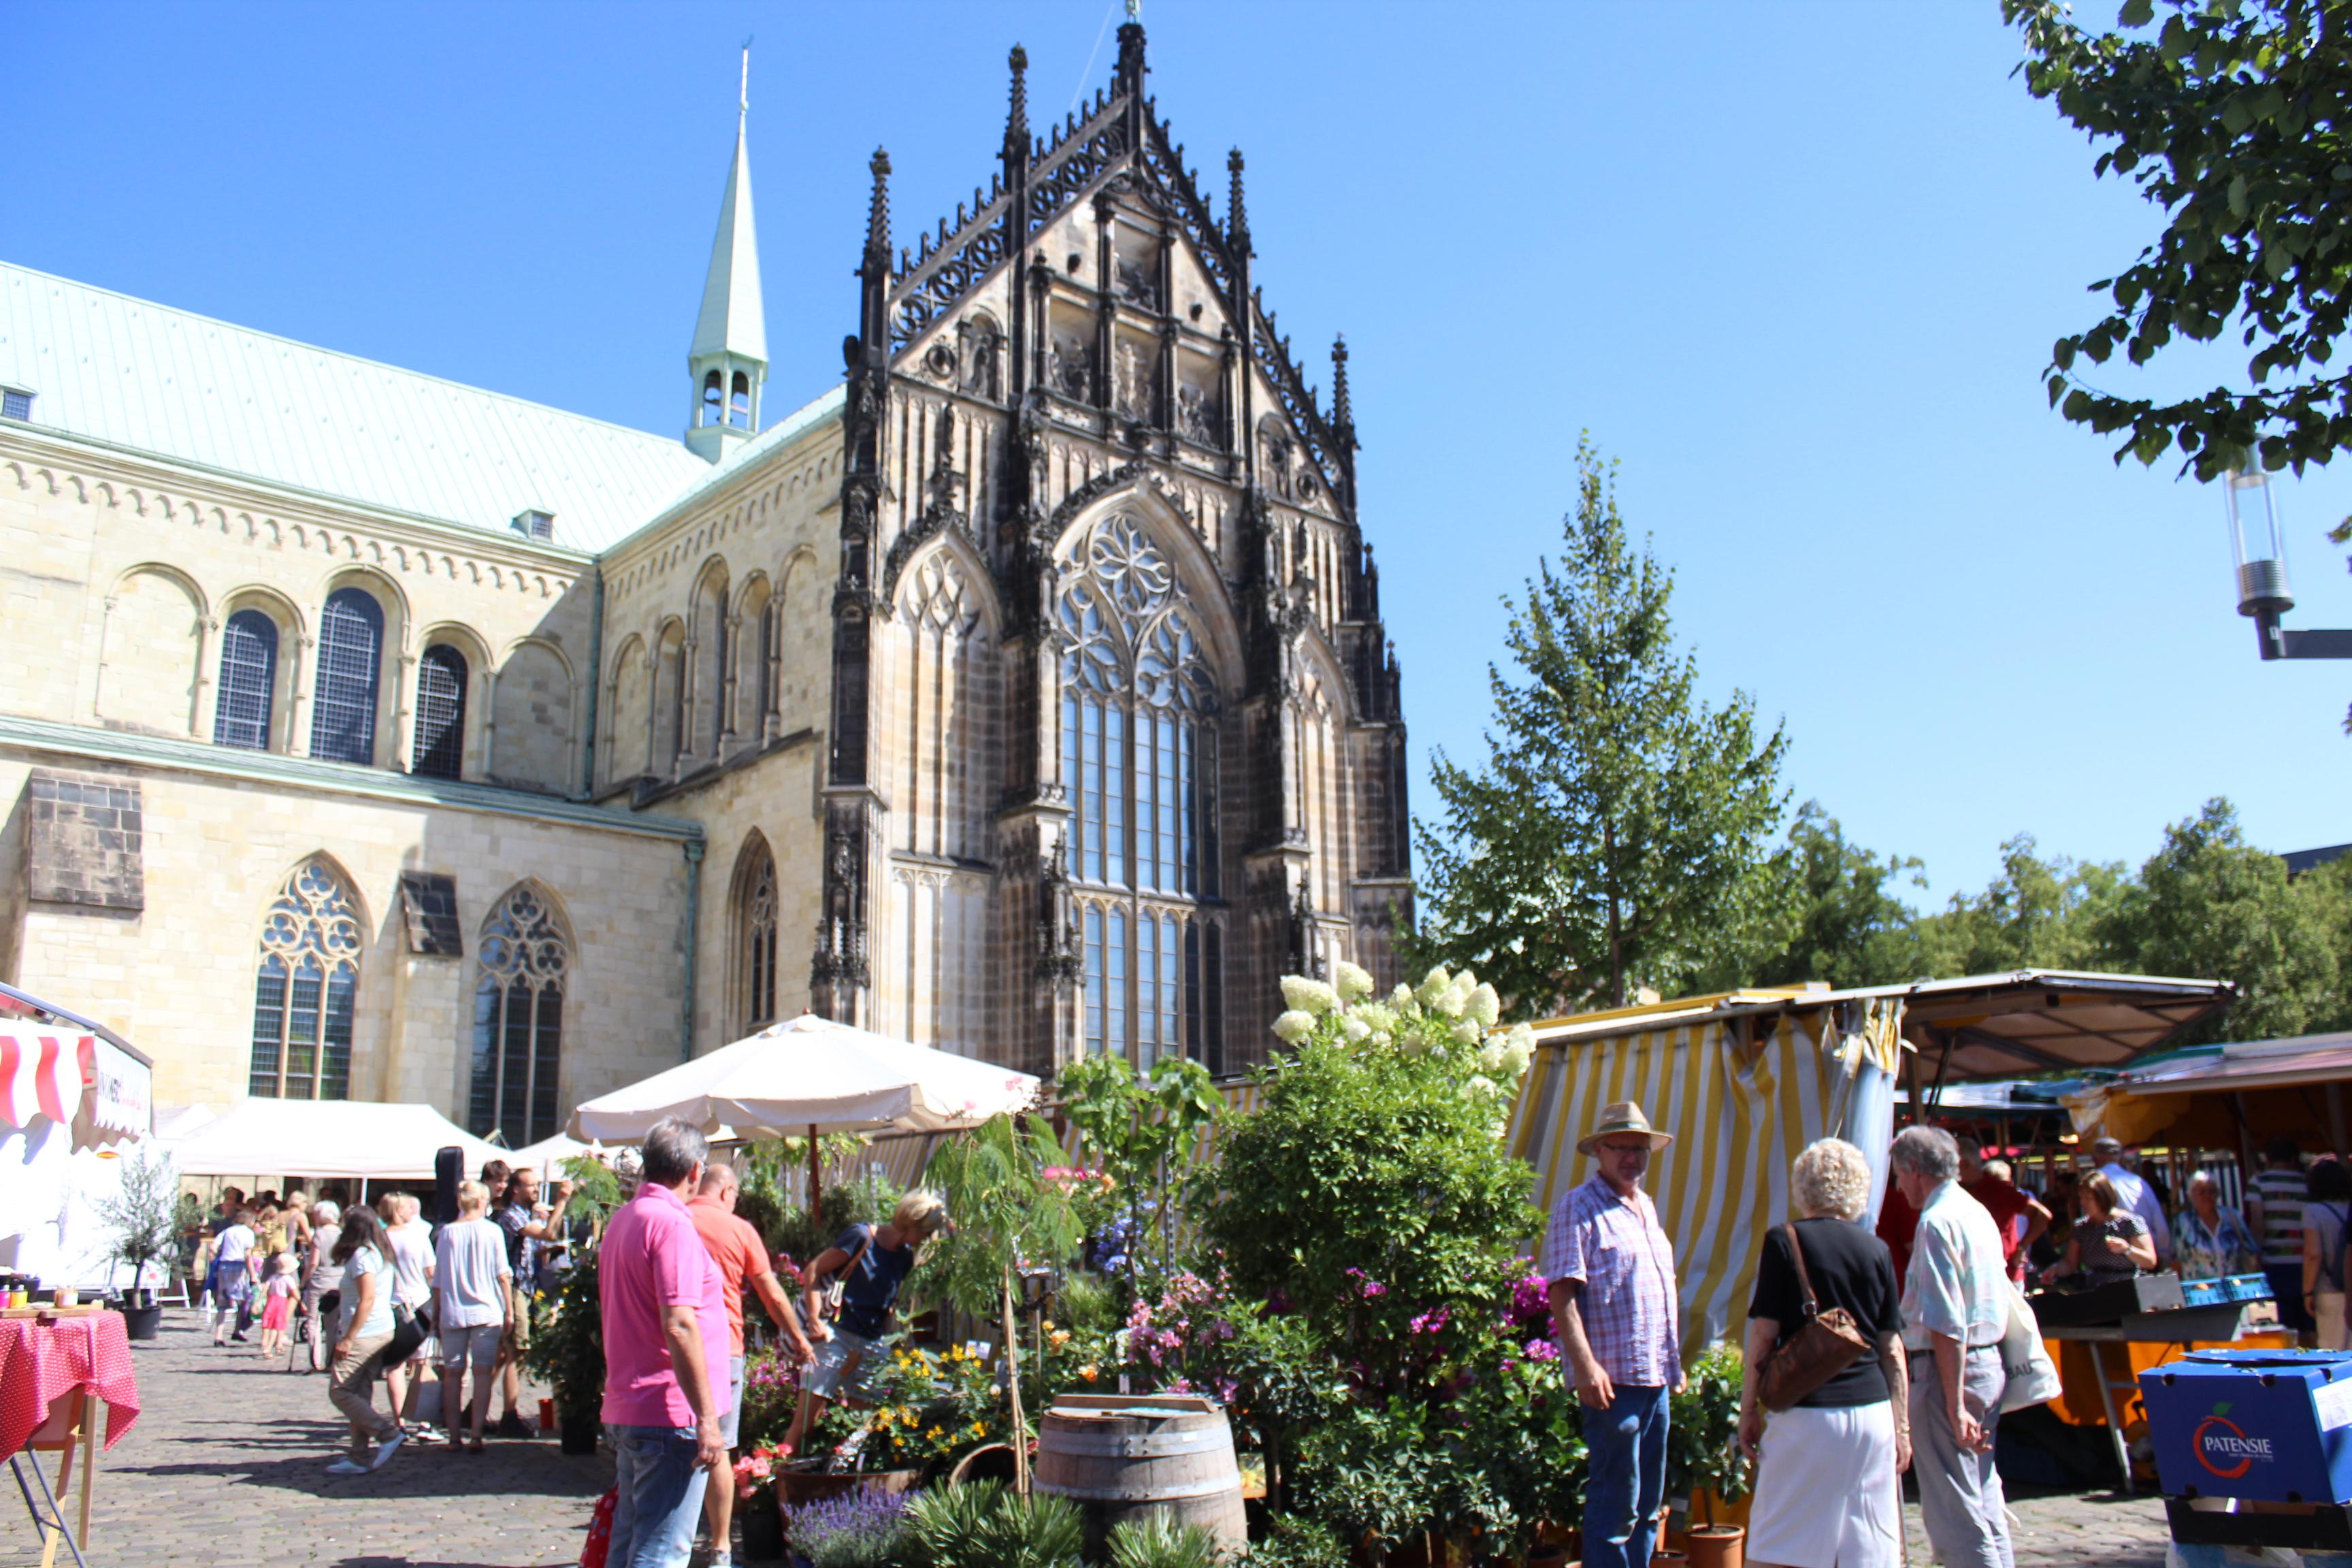 De leukste plekjes in Münster om te eten en te drinken